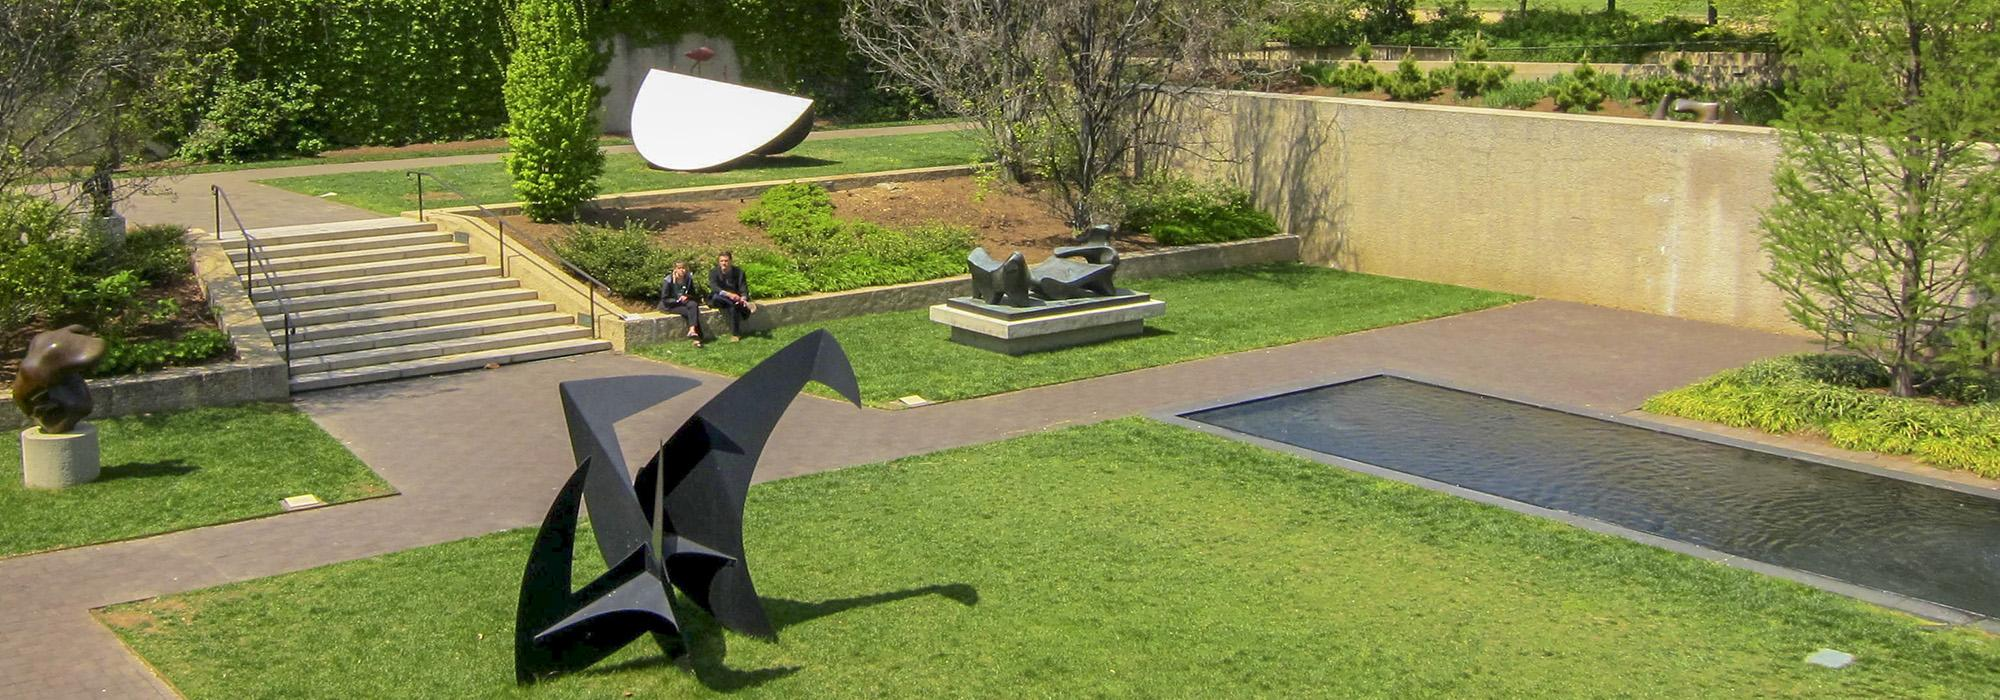 Washingtion_DC_HirshhornSculptureGarden_courtesyWikimediaCommons_2010_002_Hero.jpg